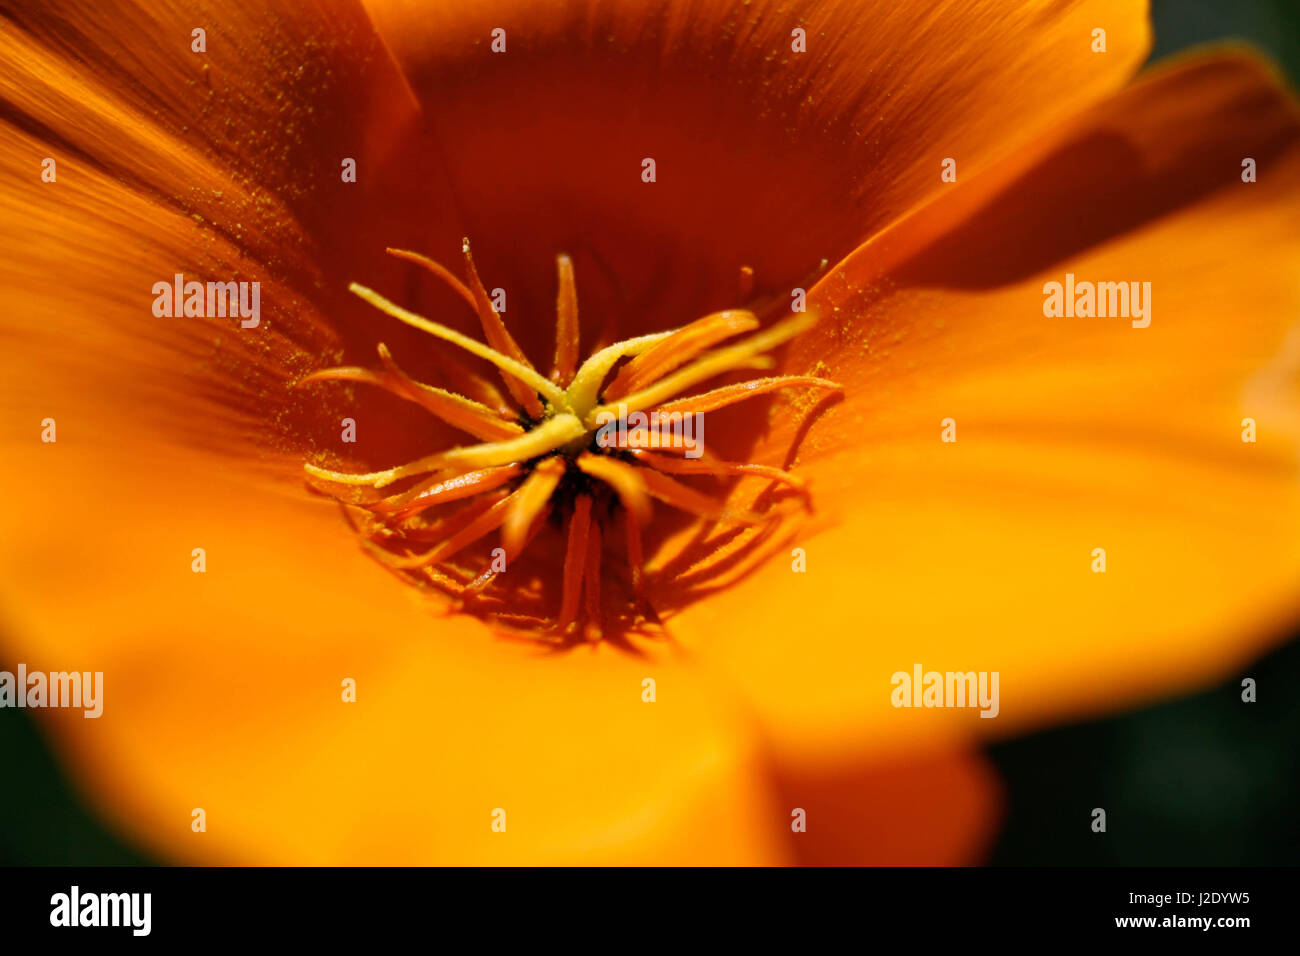 InThePoppy   - Stock Image